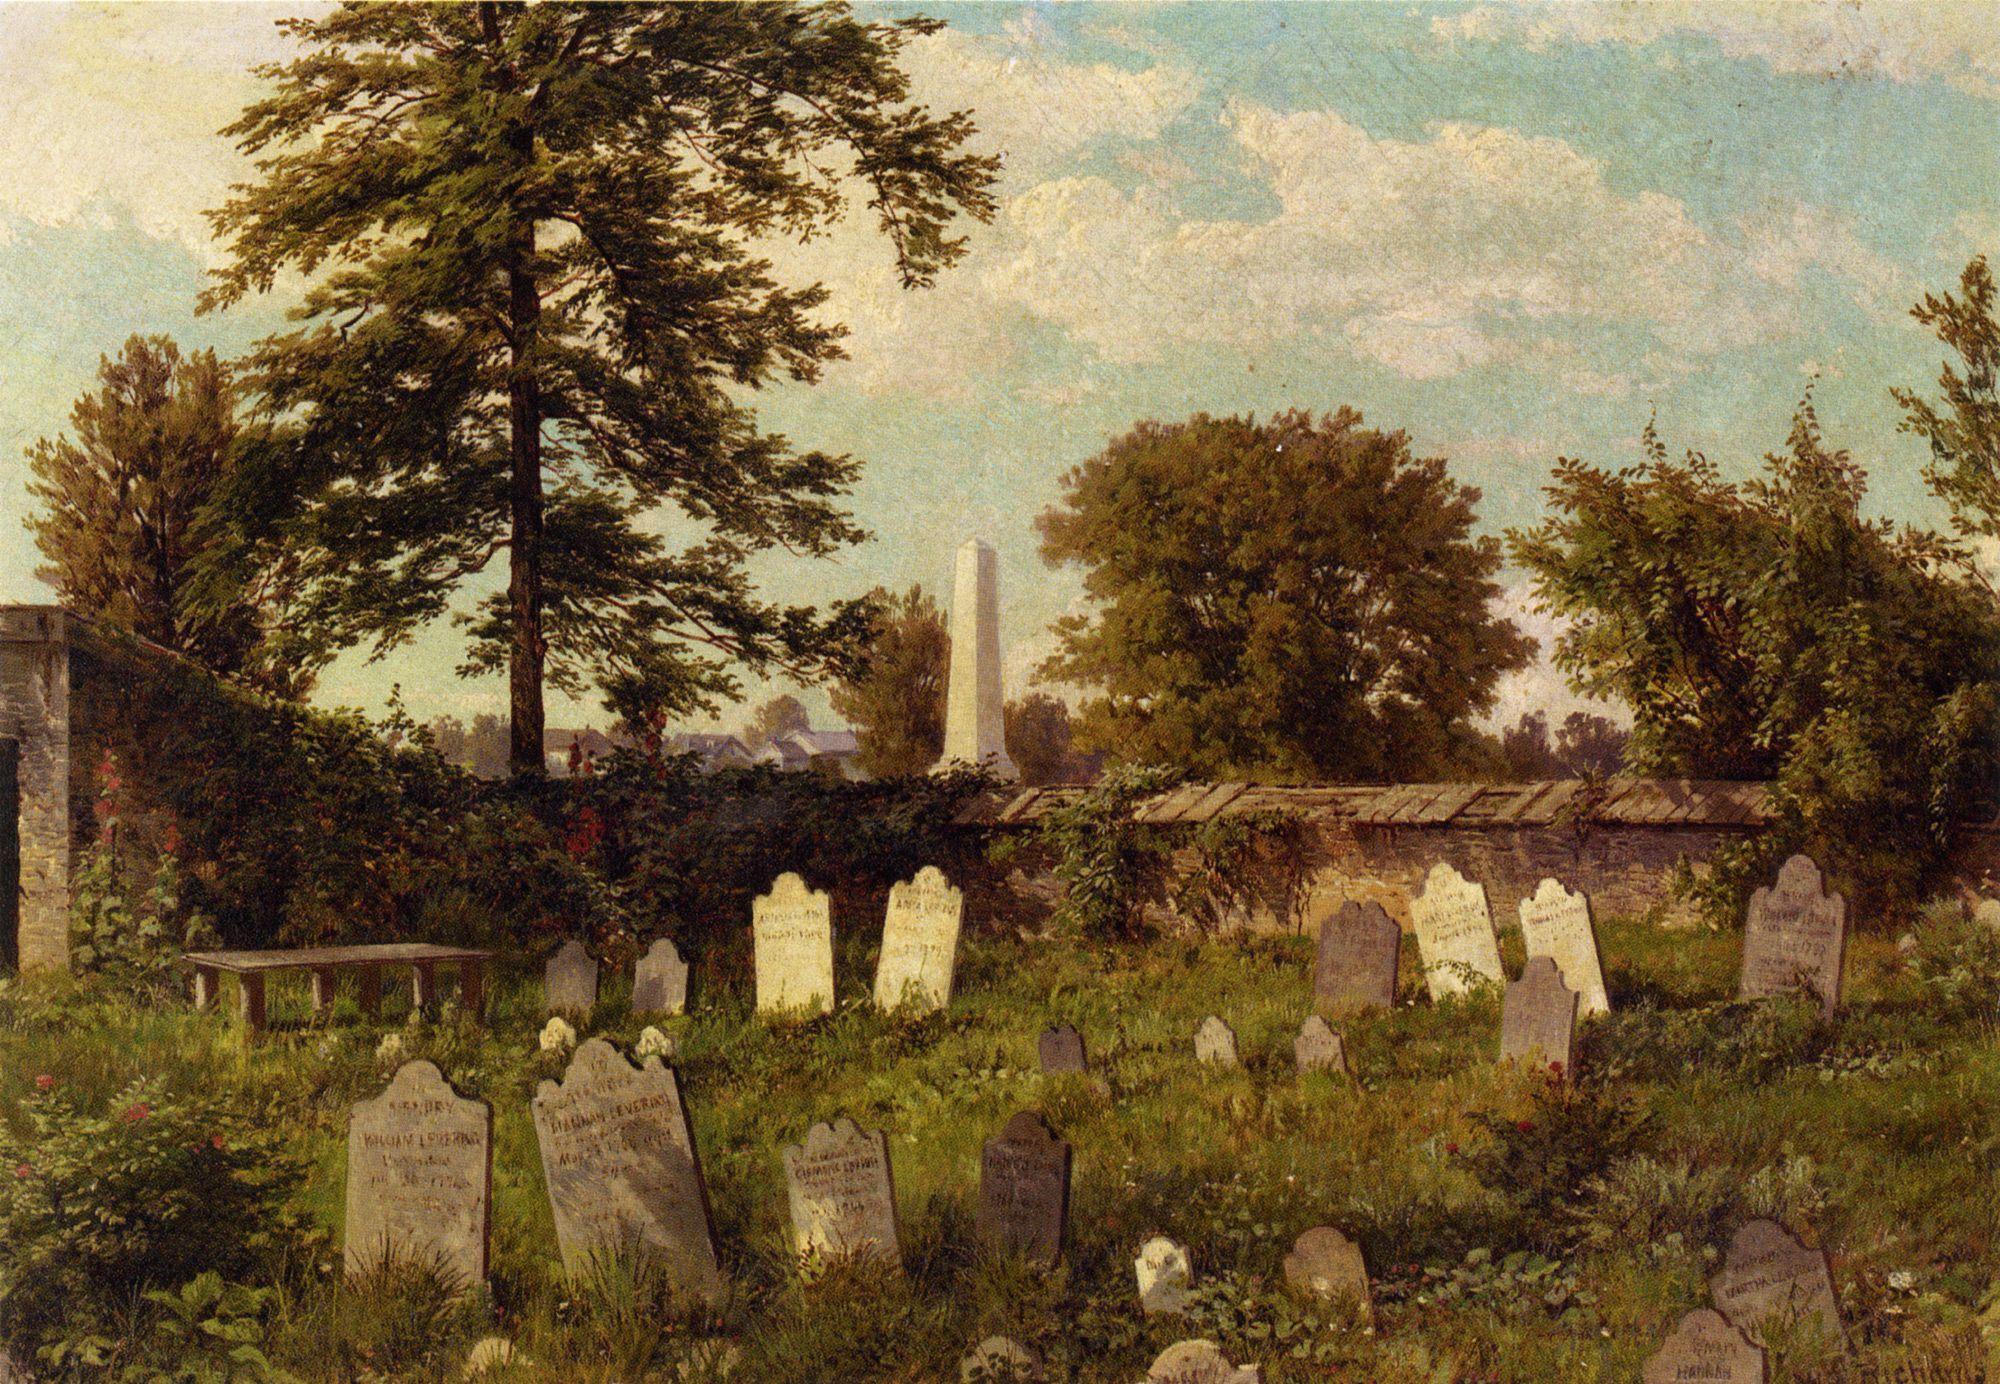 Richards_William_Trost_Leverington_Cemetery